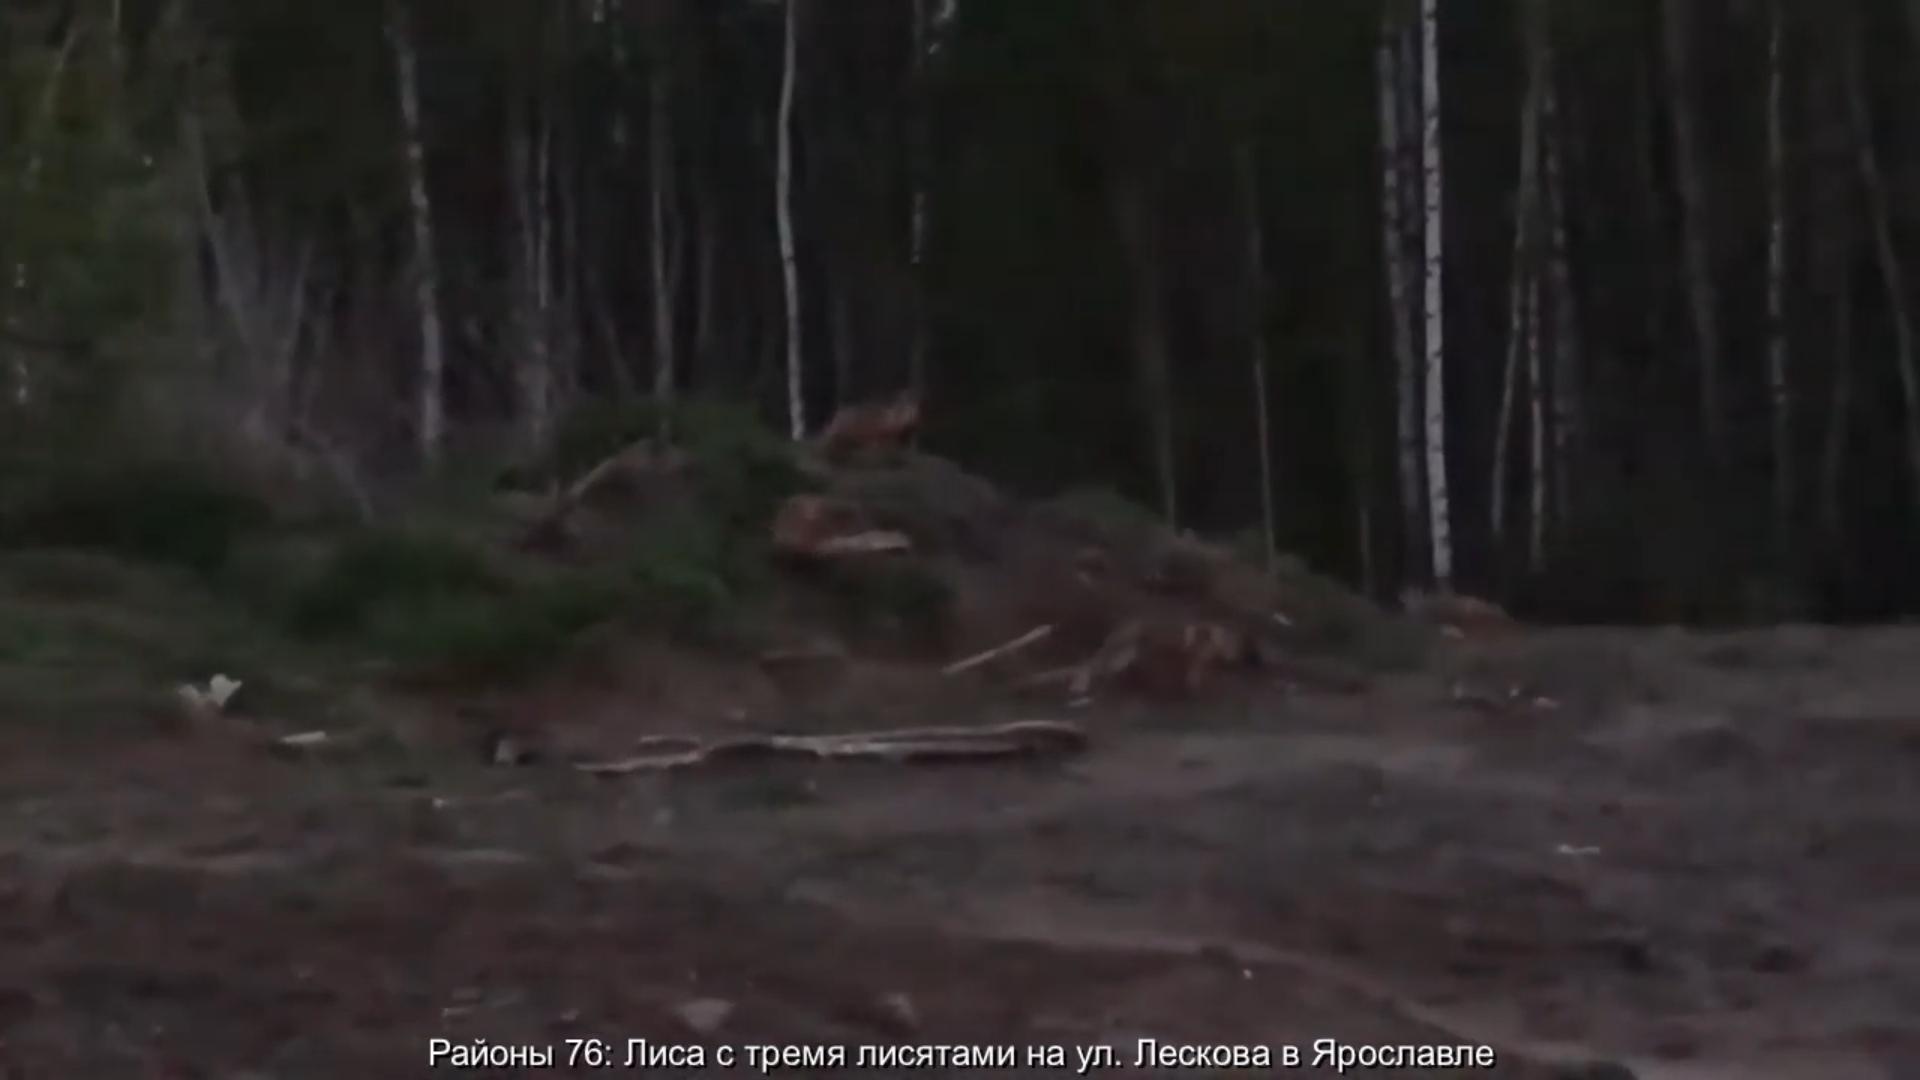 В Ярославле заметили лису с тремя лисятами: видео